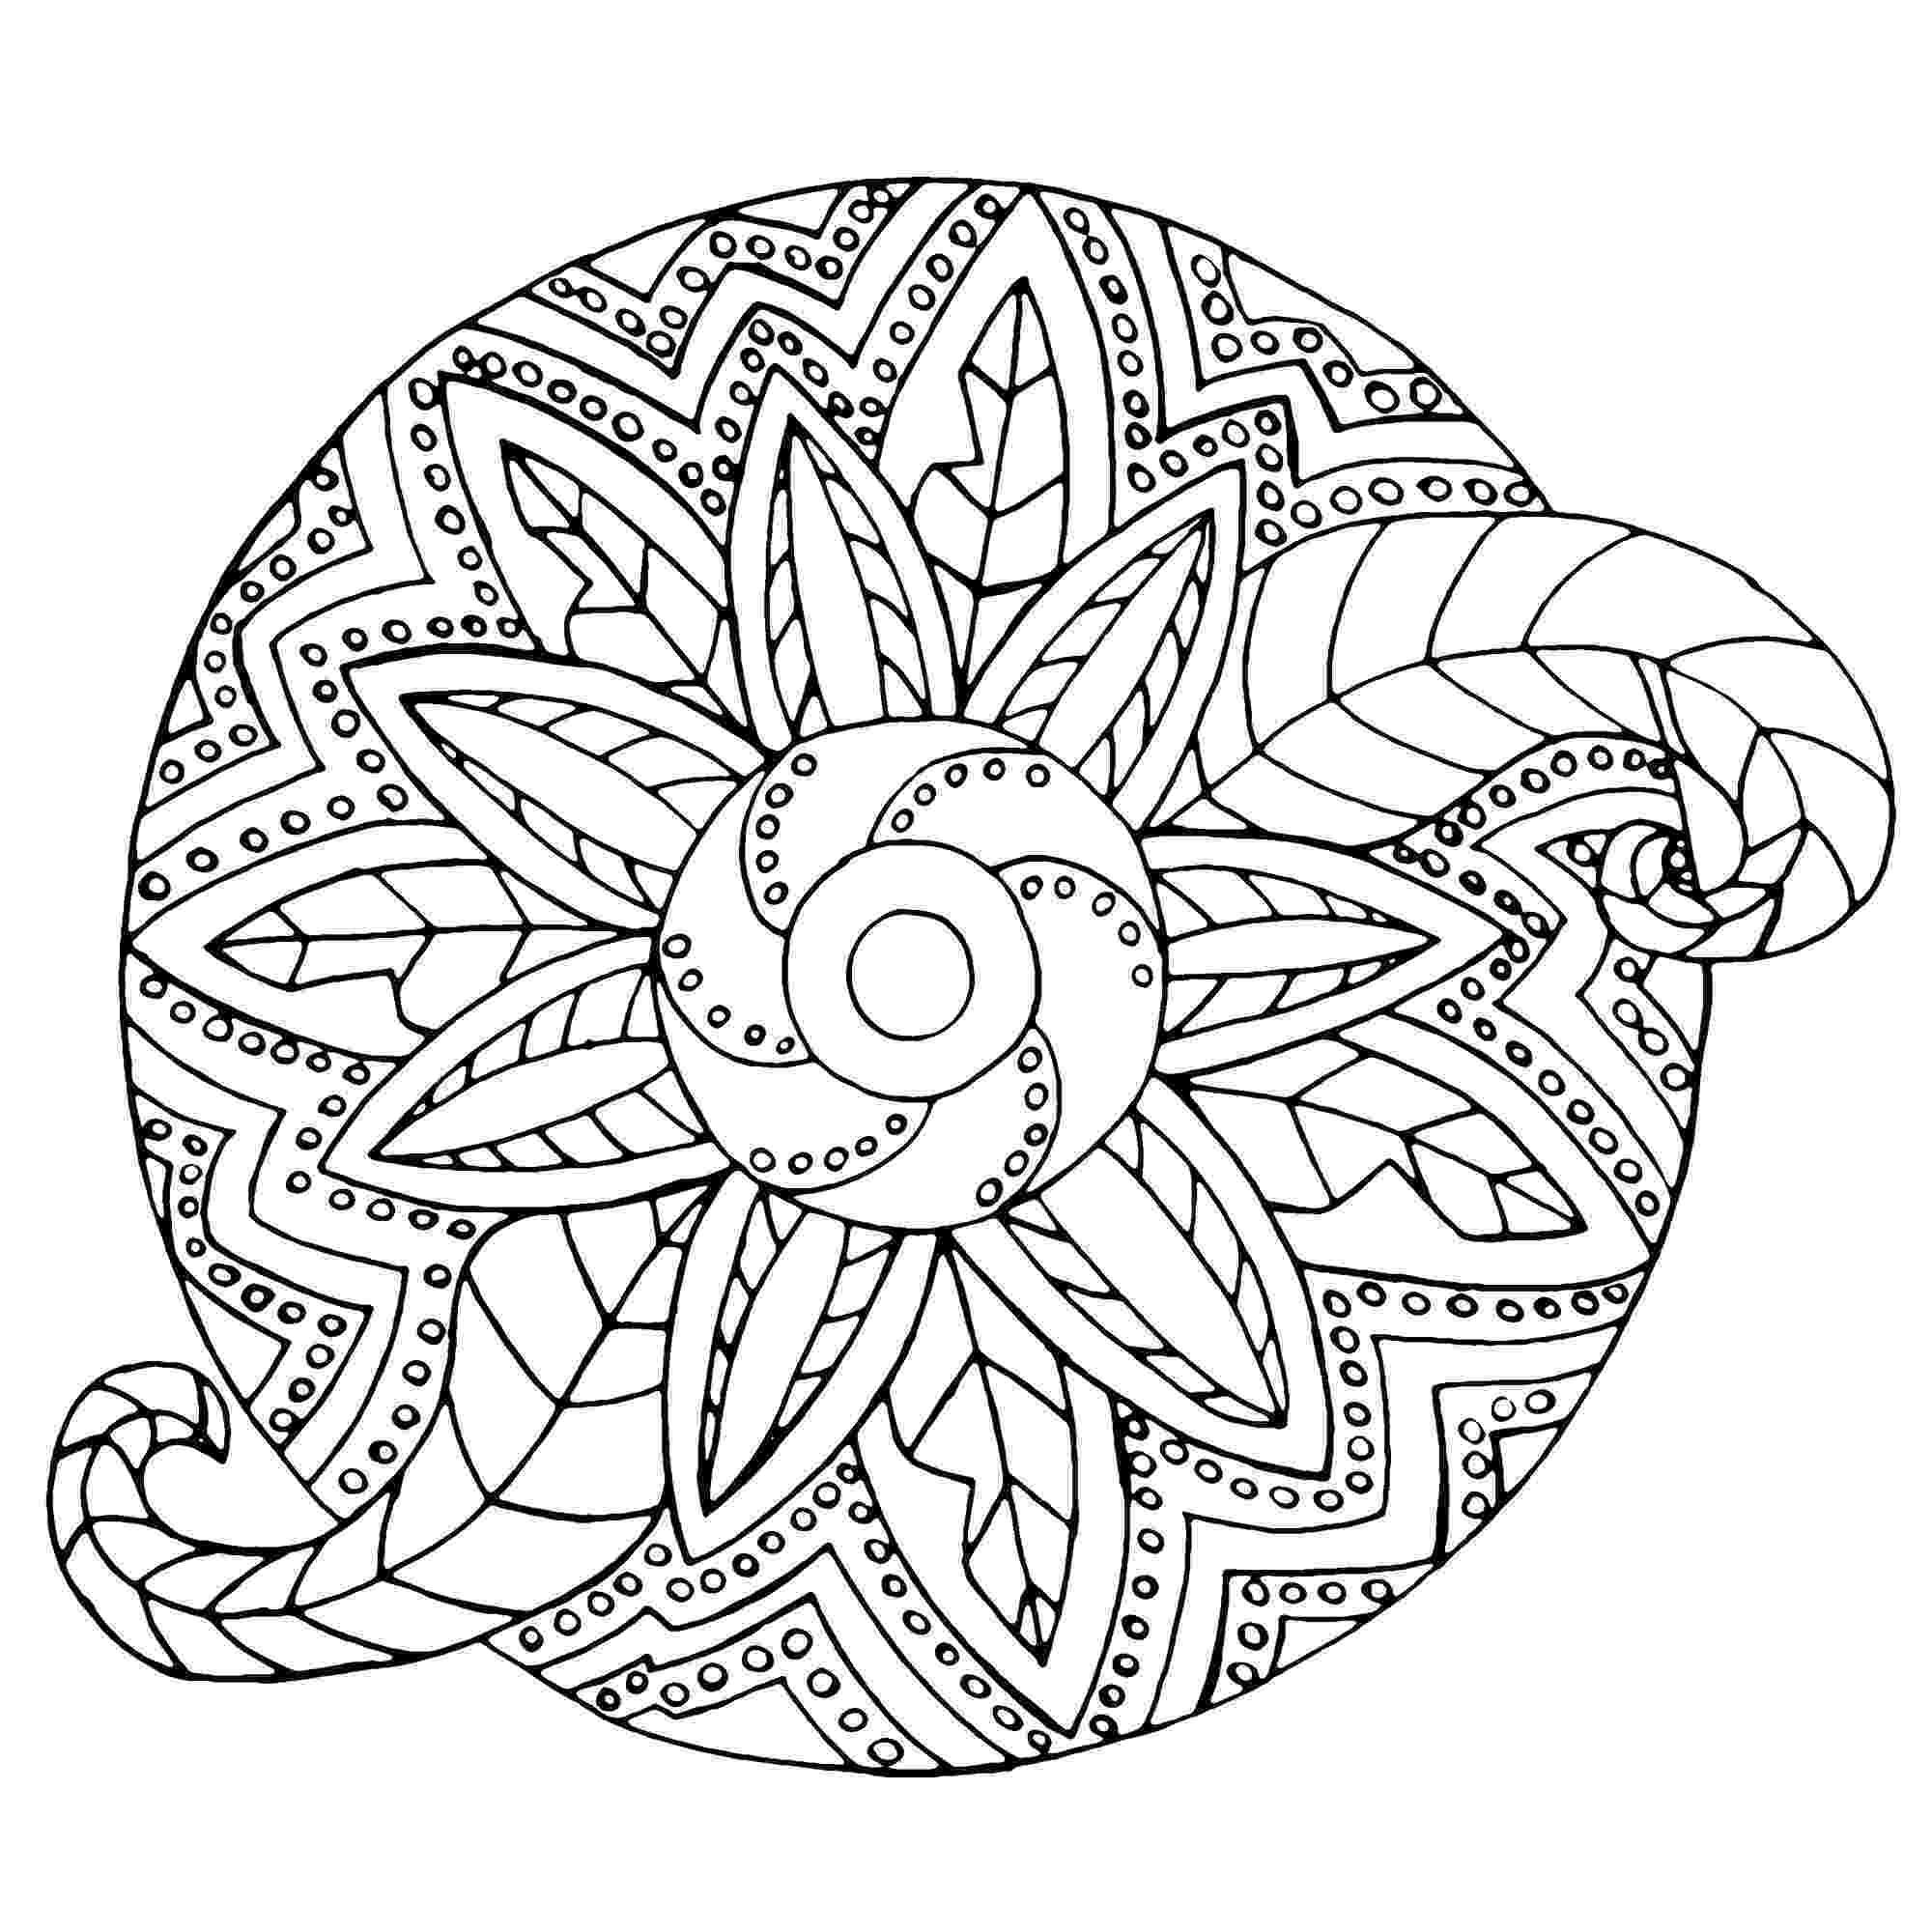 mandala color animal mandala coloring pages to download and print for free color mandala